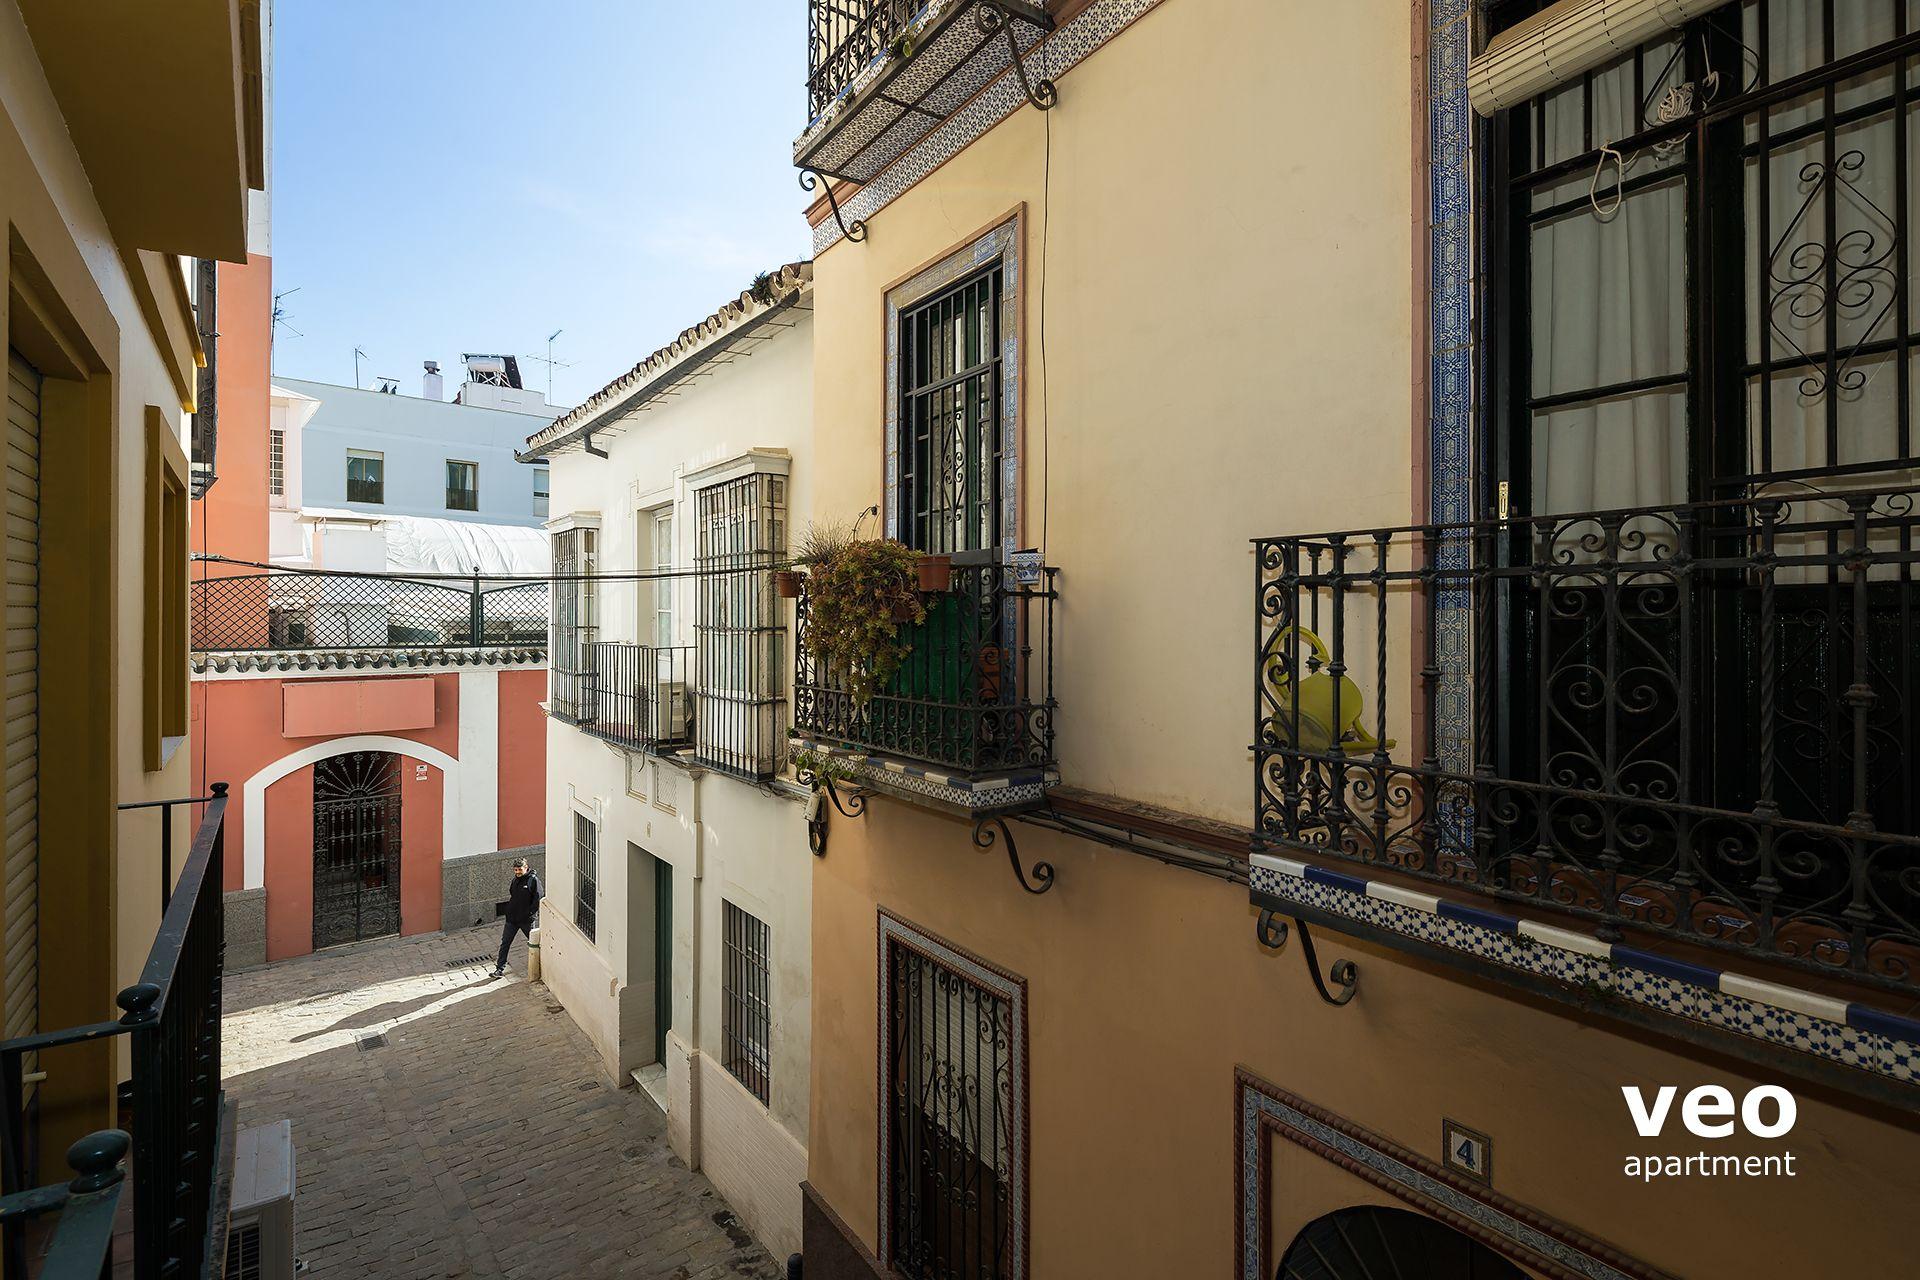 Seville Apartment Adolfo Cu U00e9llar Street Seville Spain